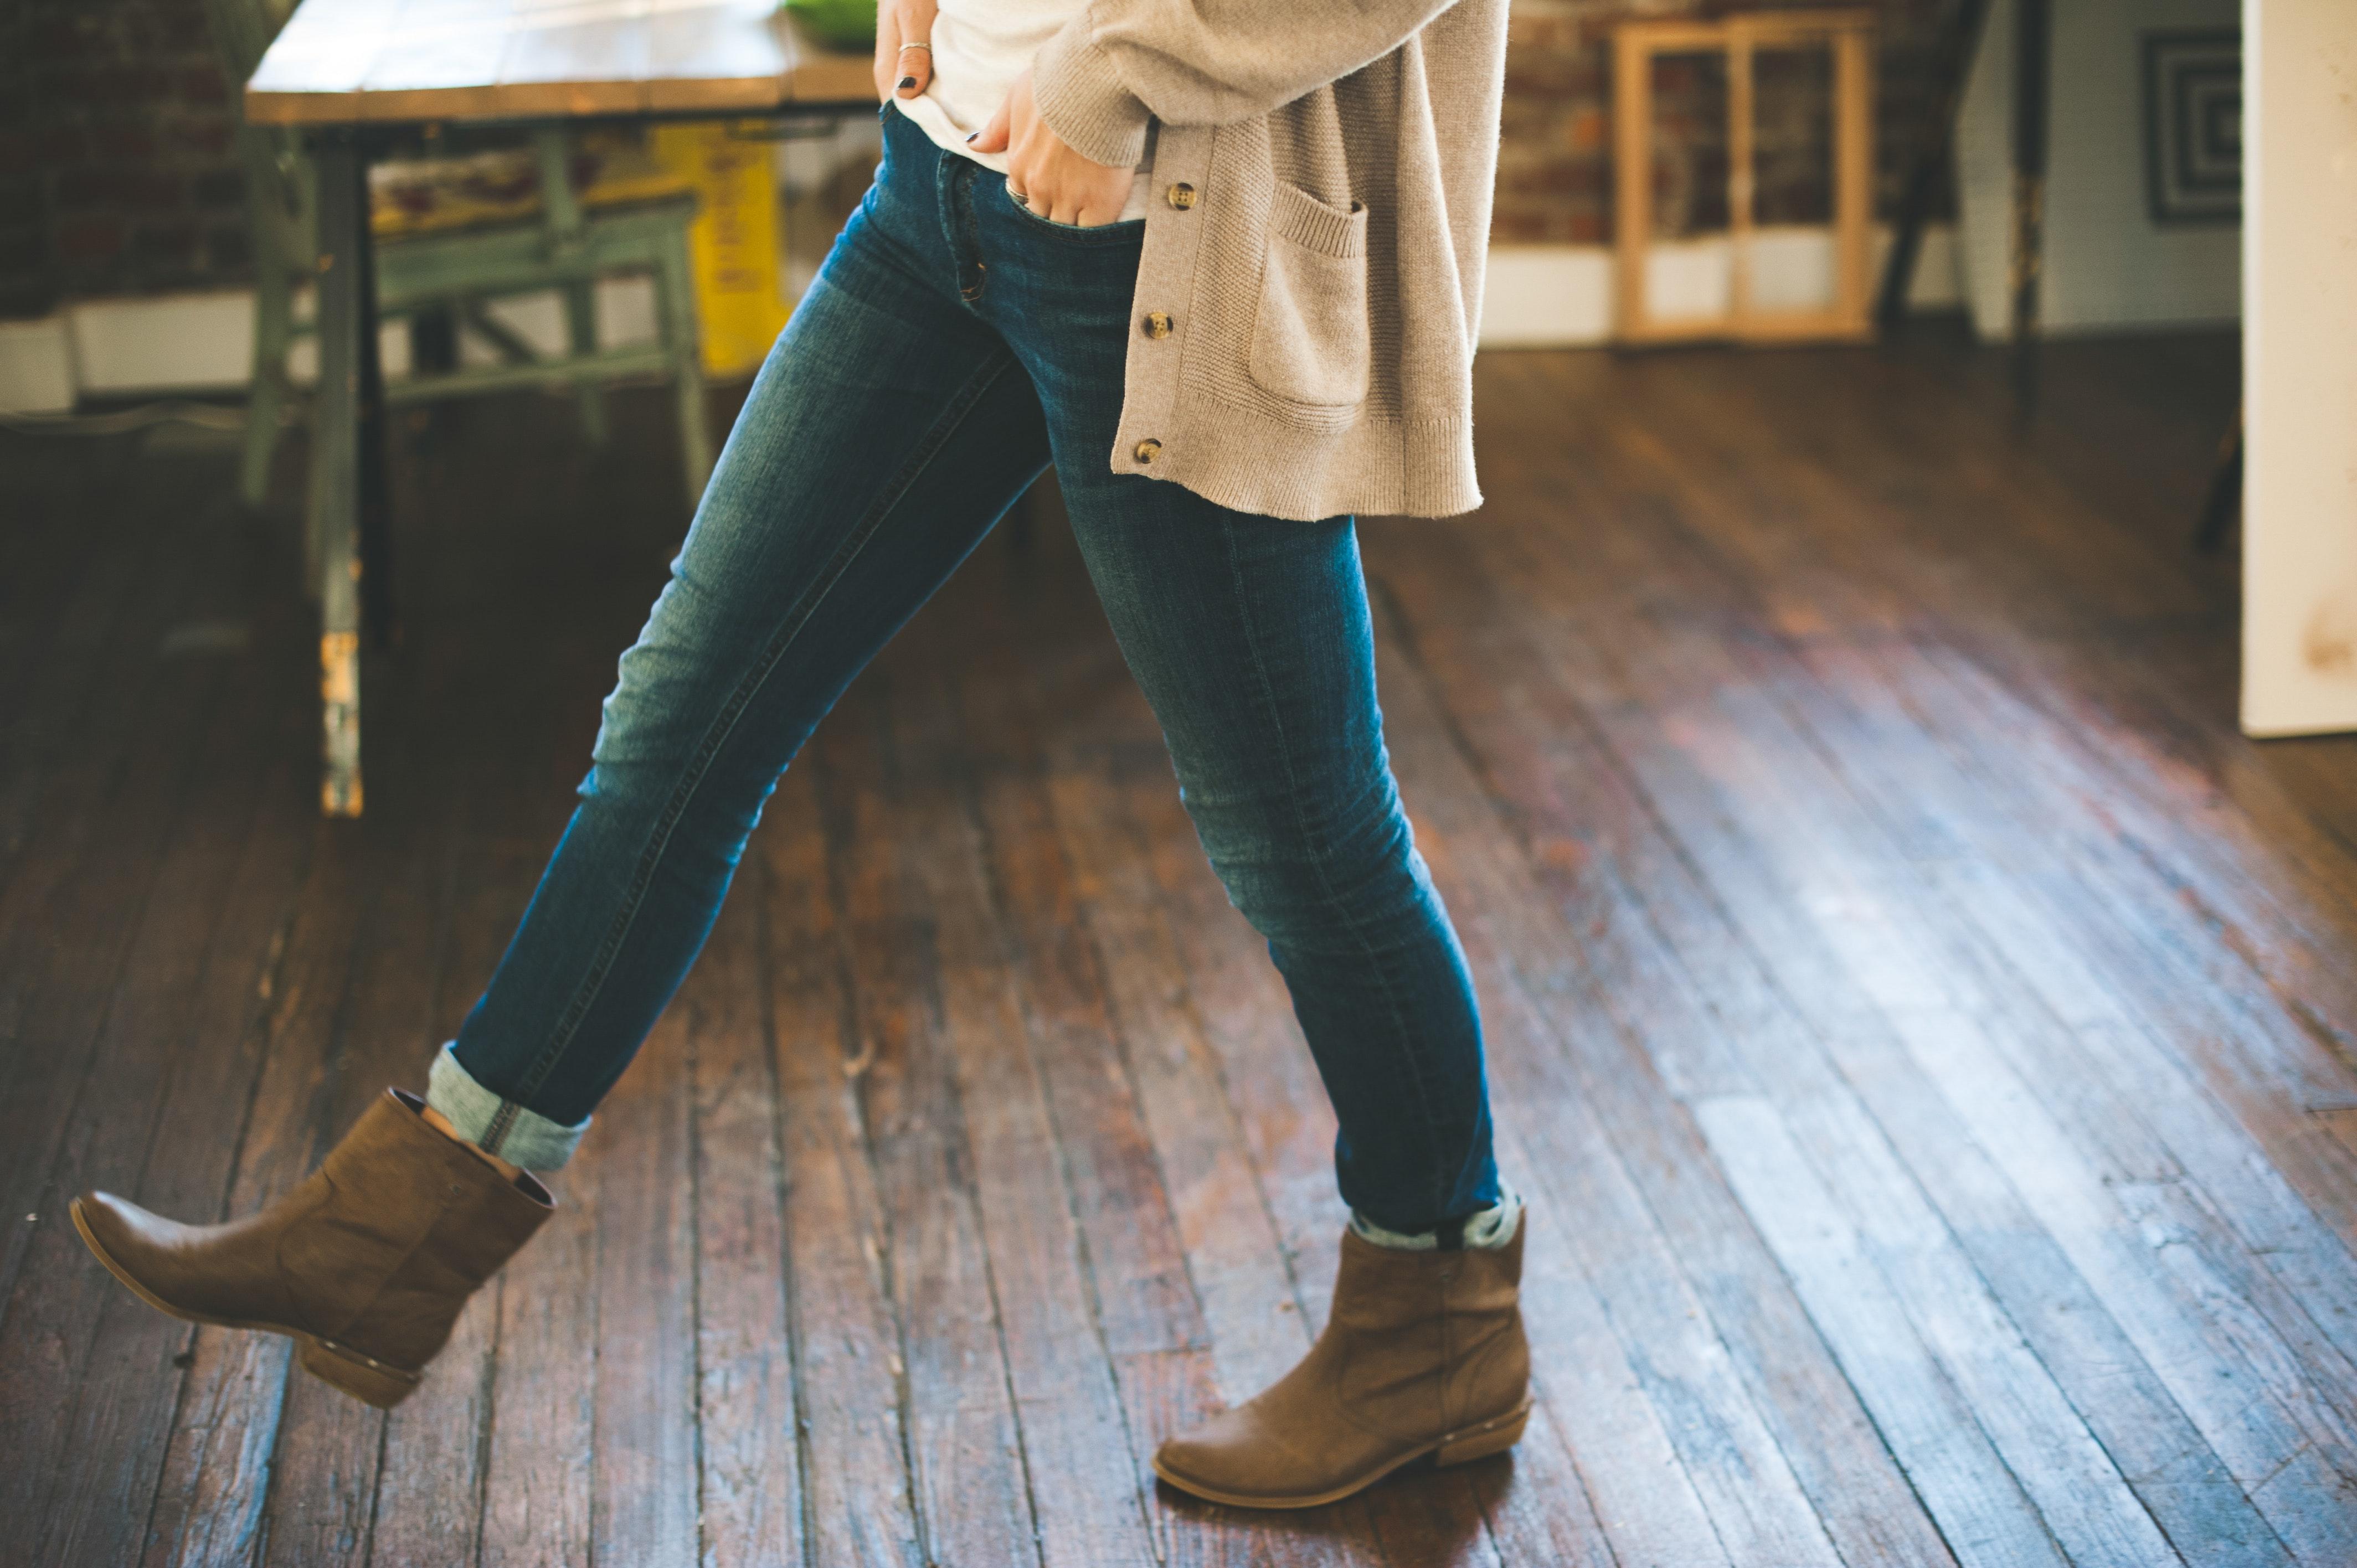 Chica andando sobre un suelo de madera